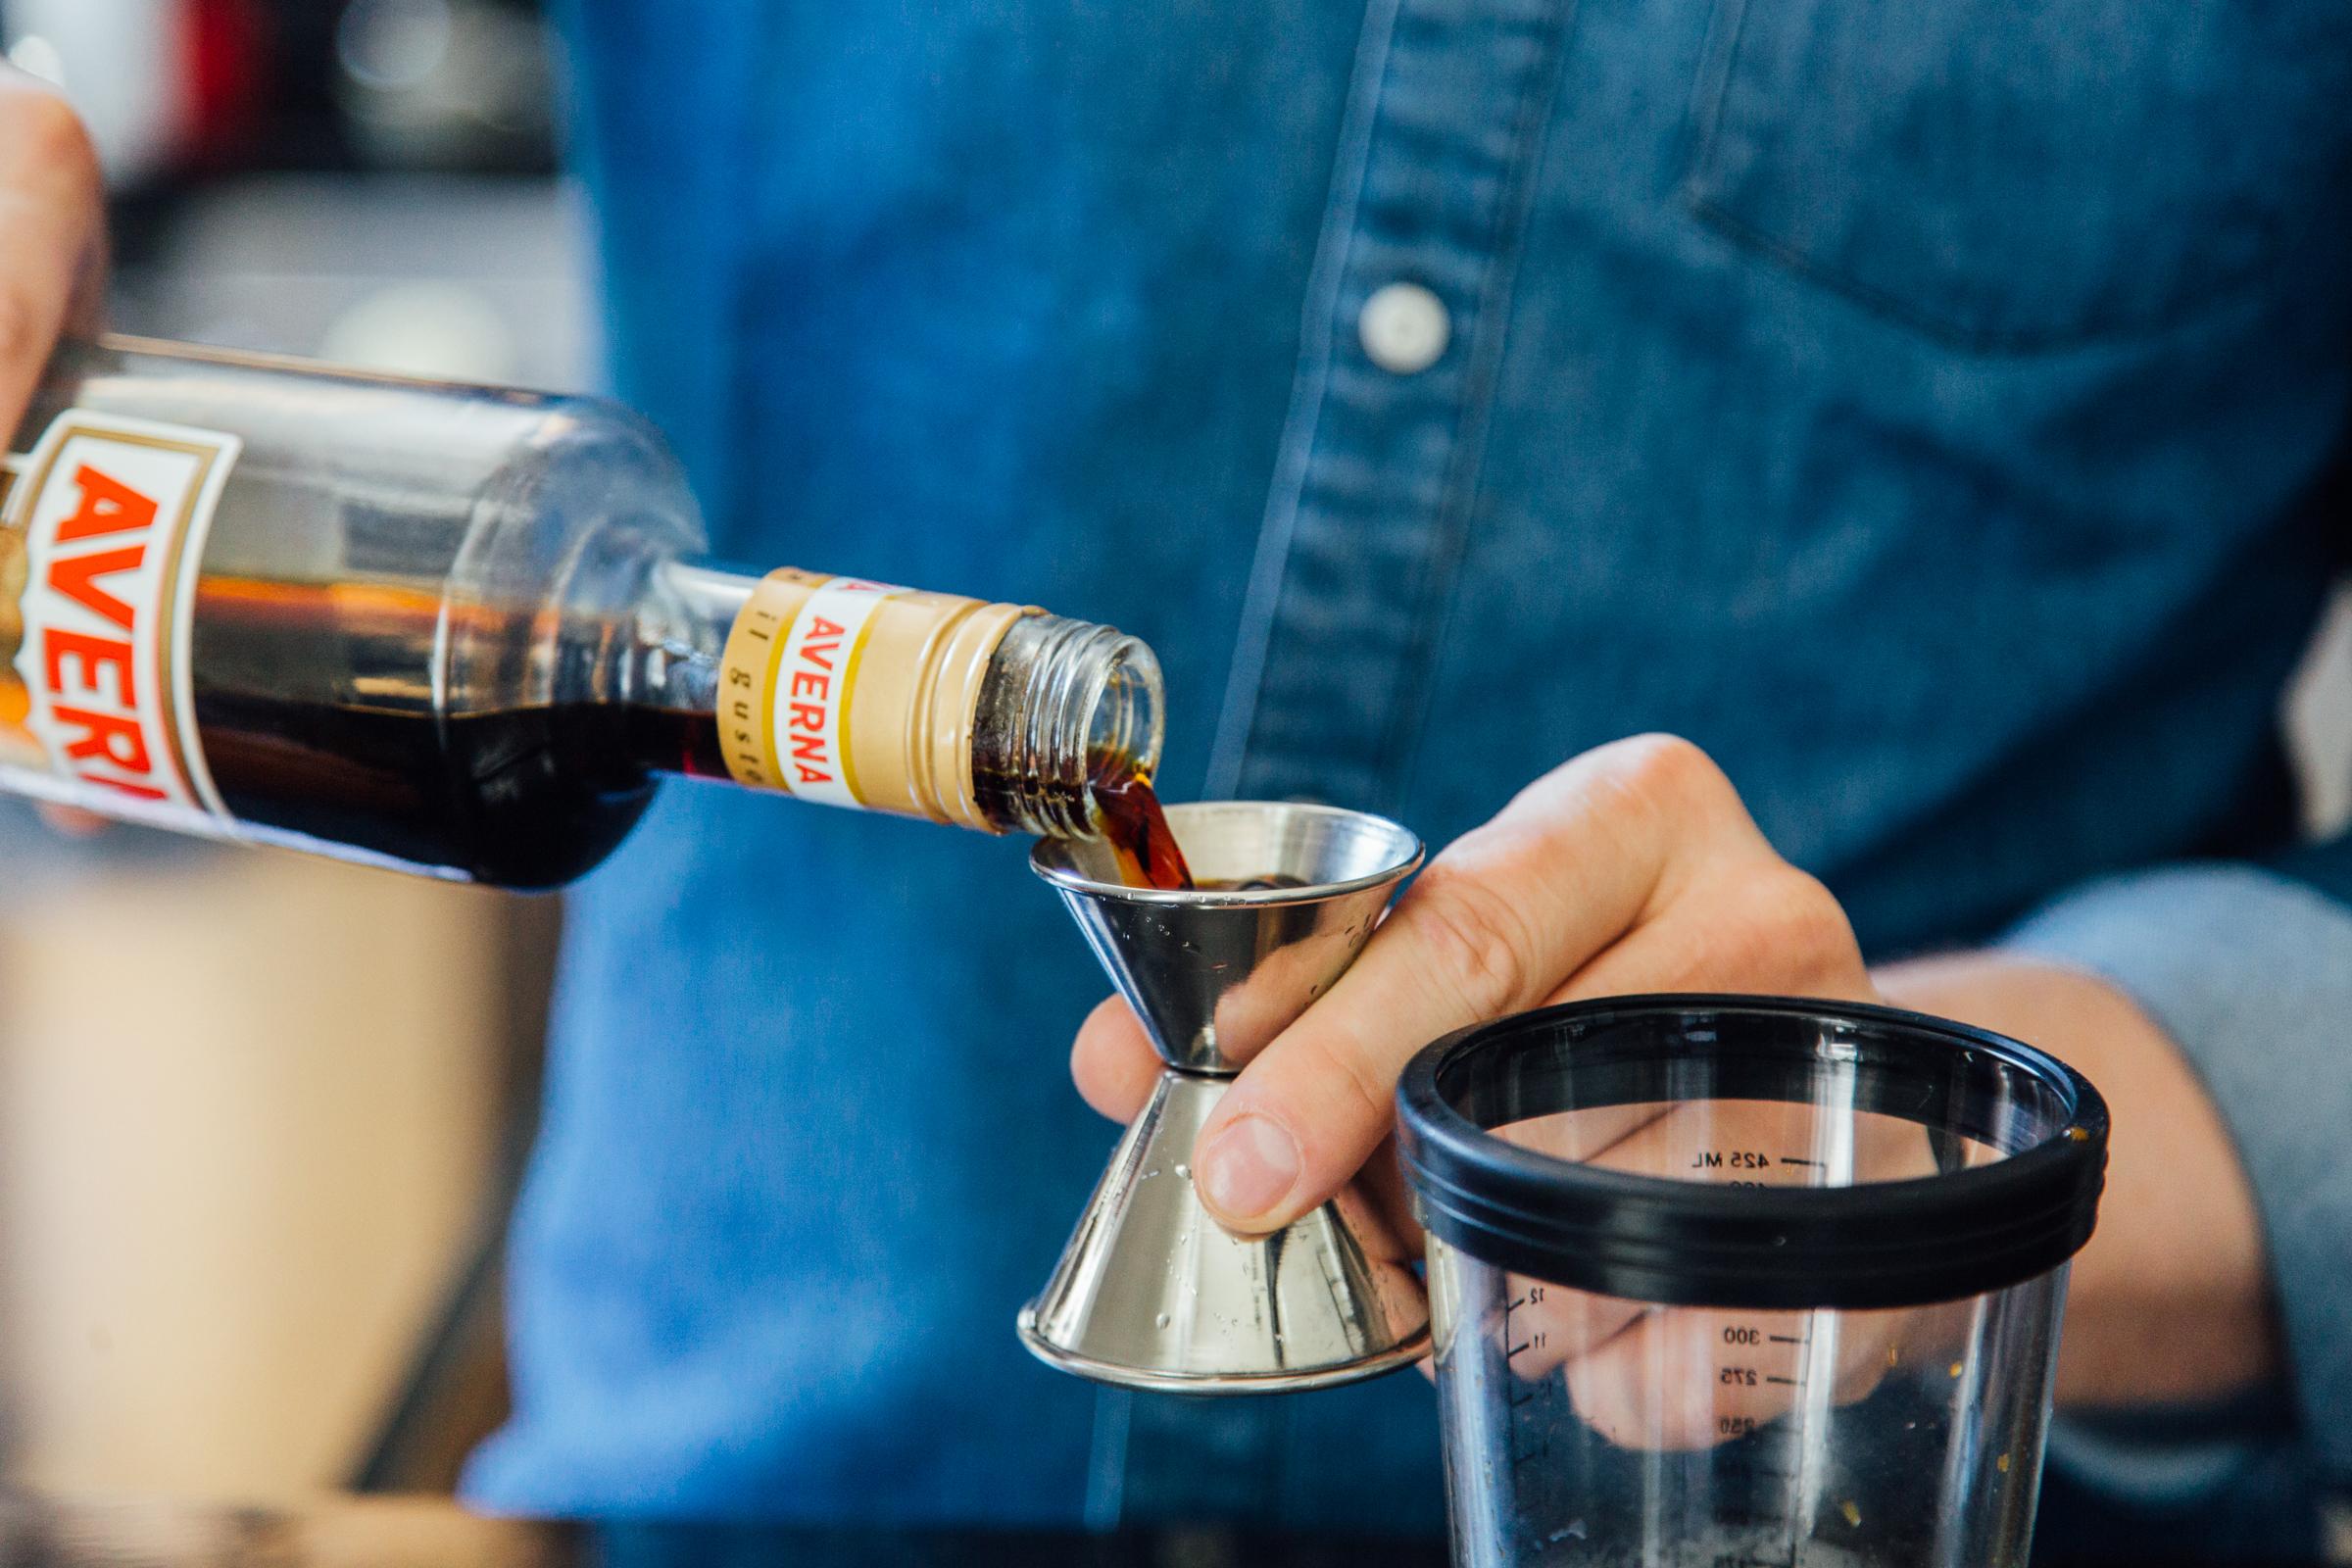 Adding Averna to coffee cocktail